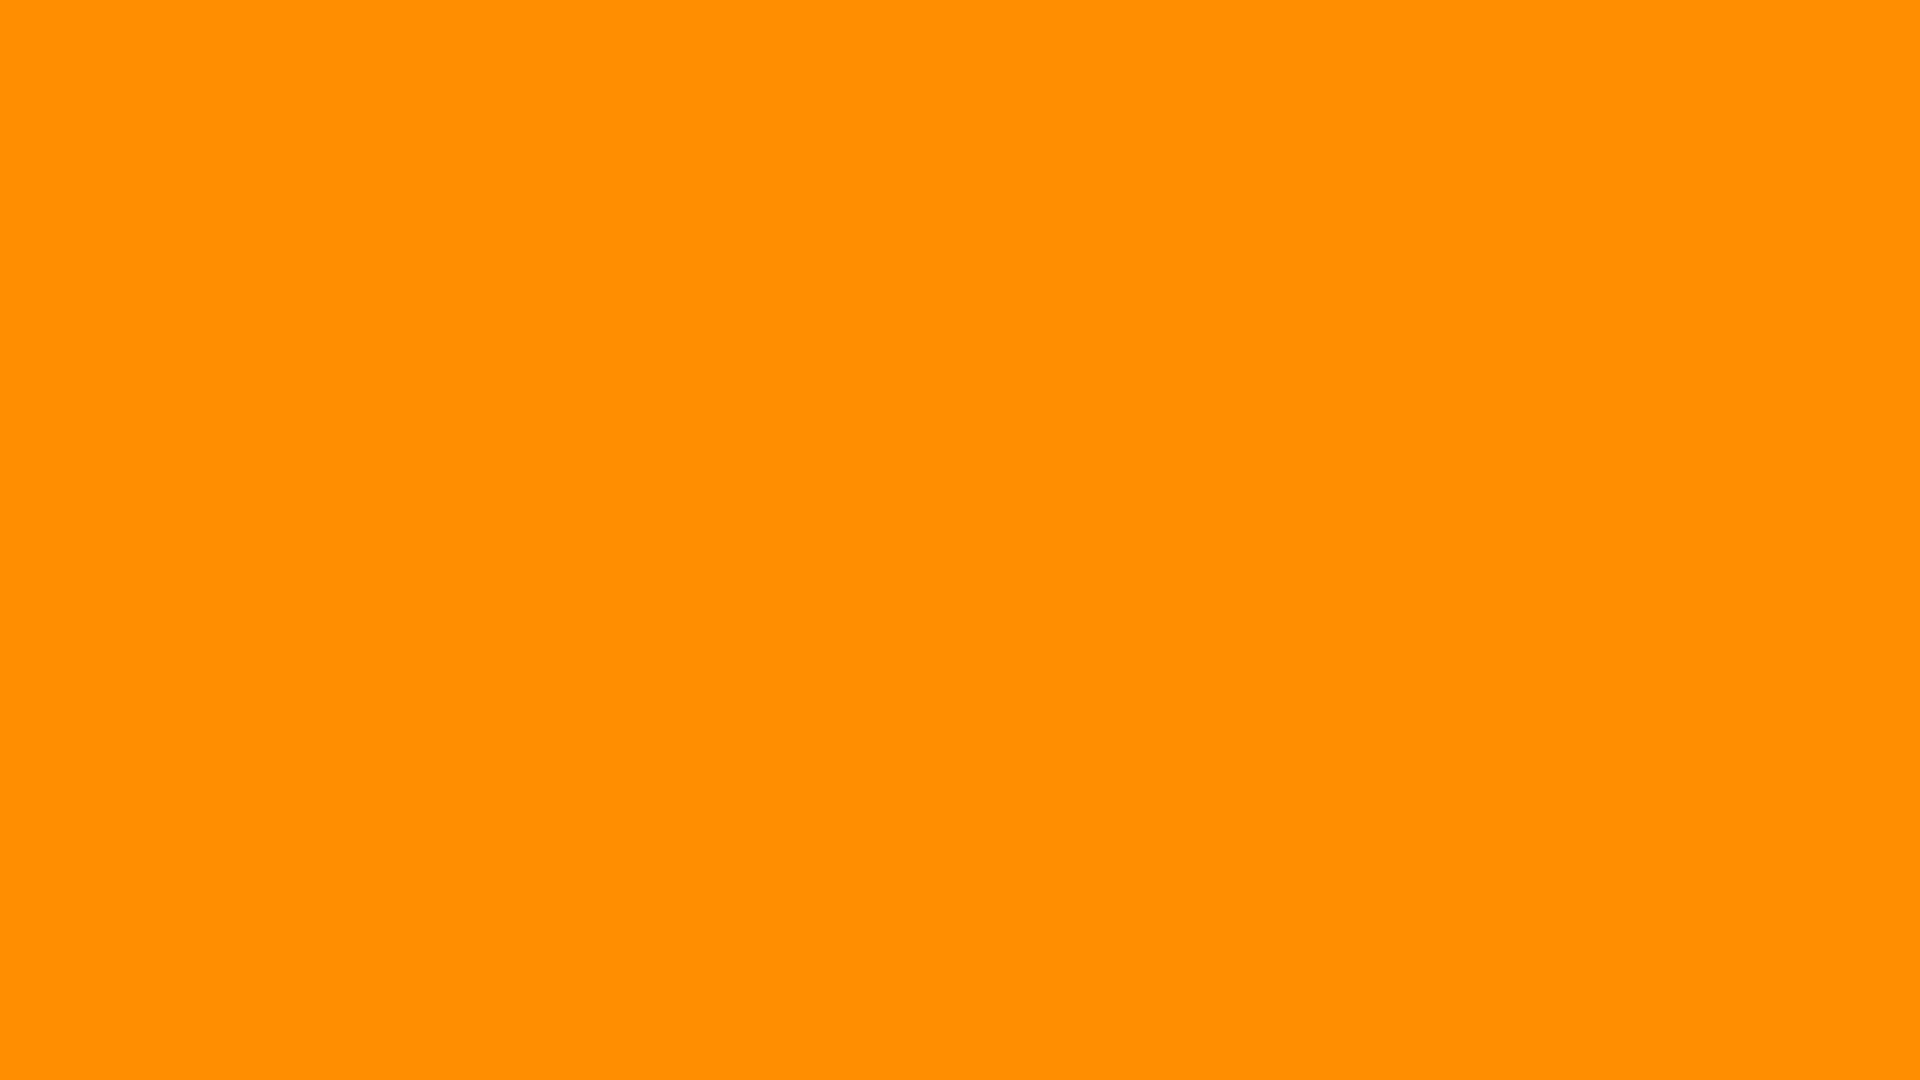 1920x1080 Princeton Orange Solid Color Background